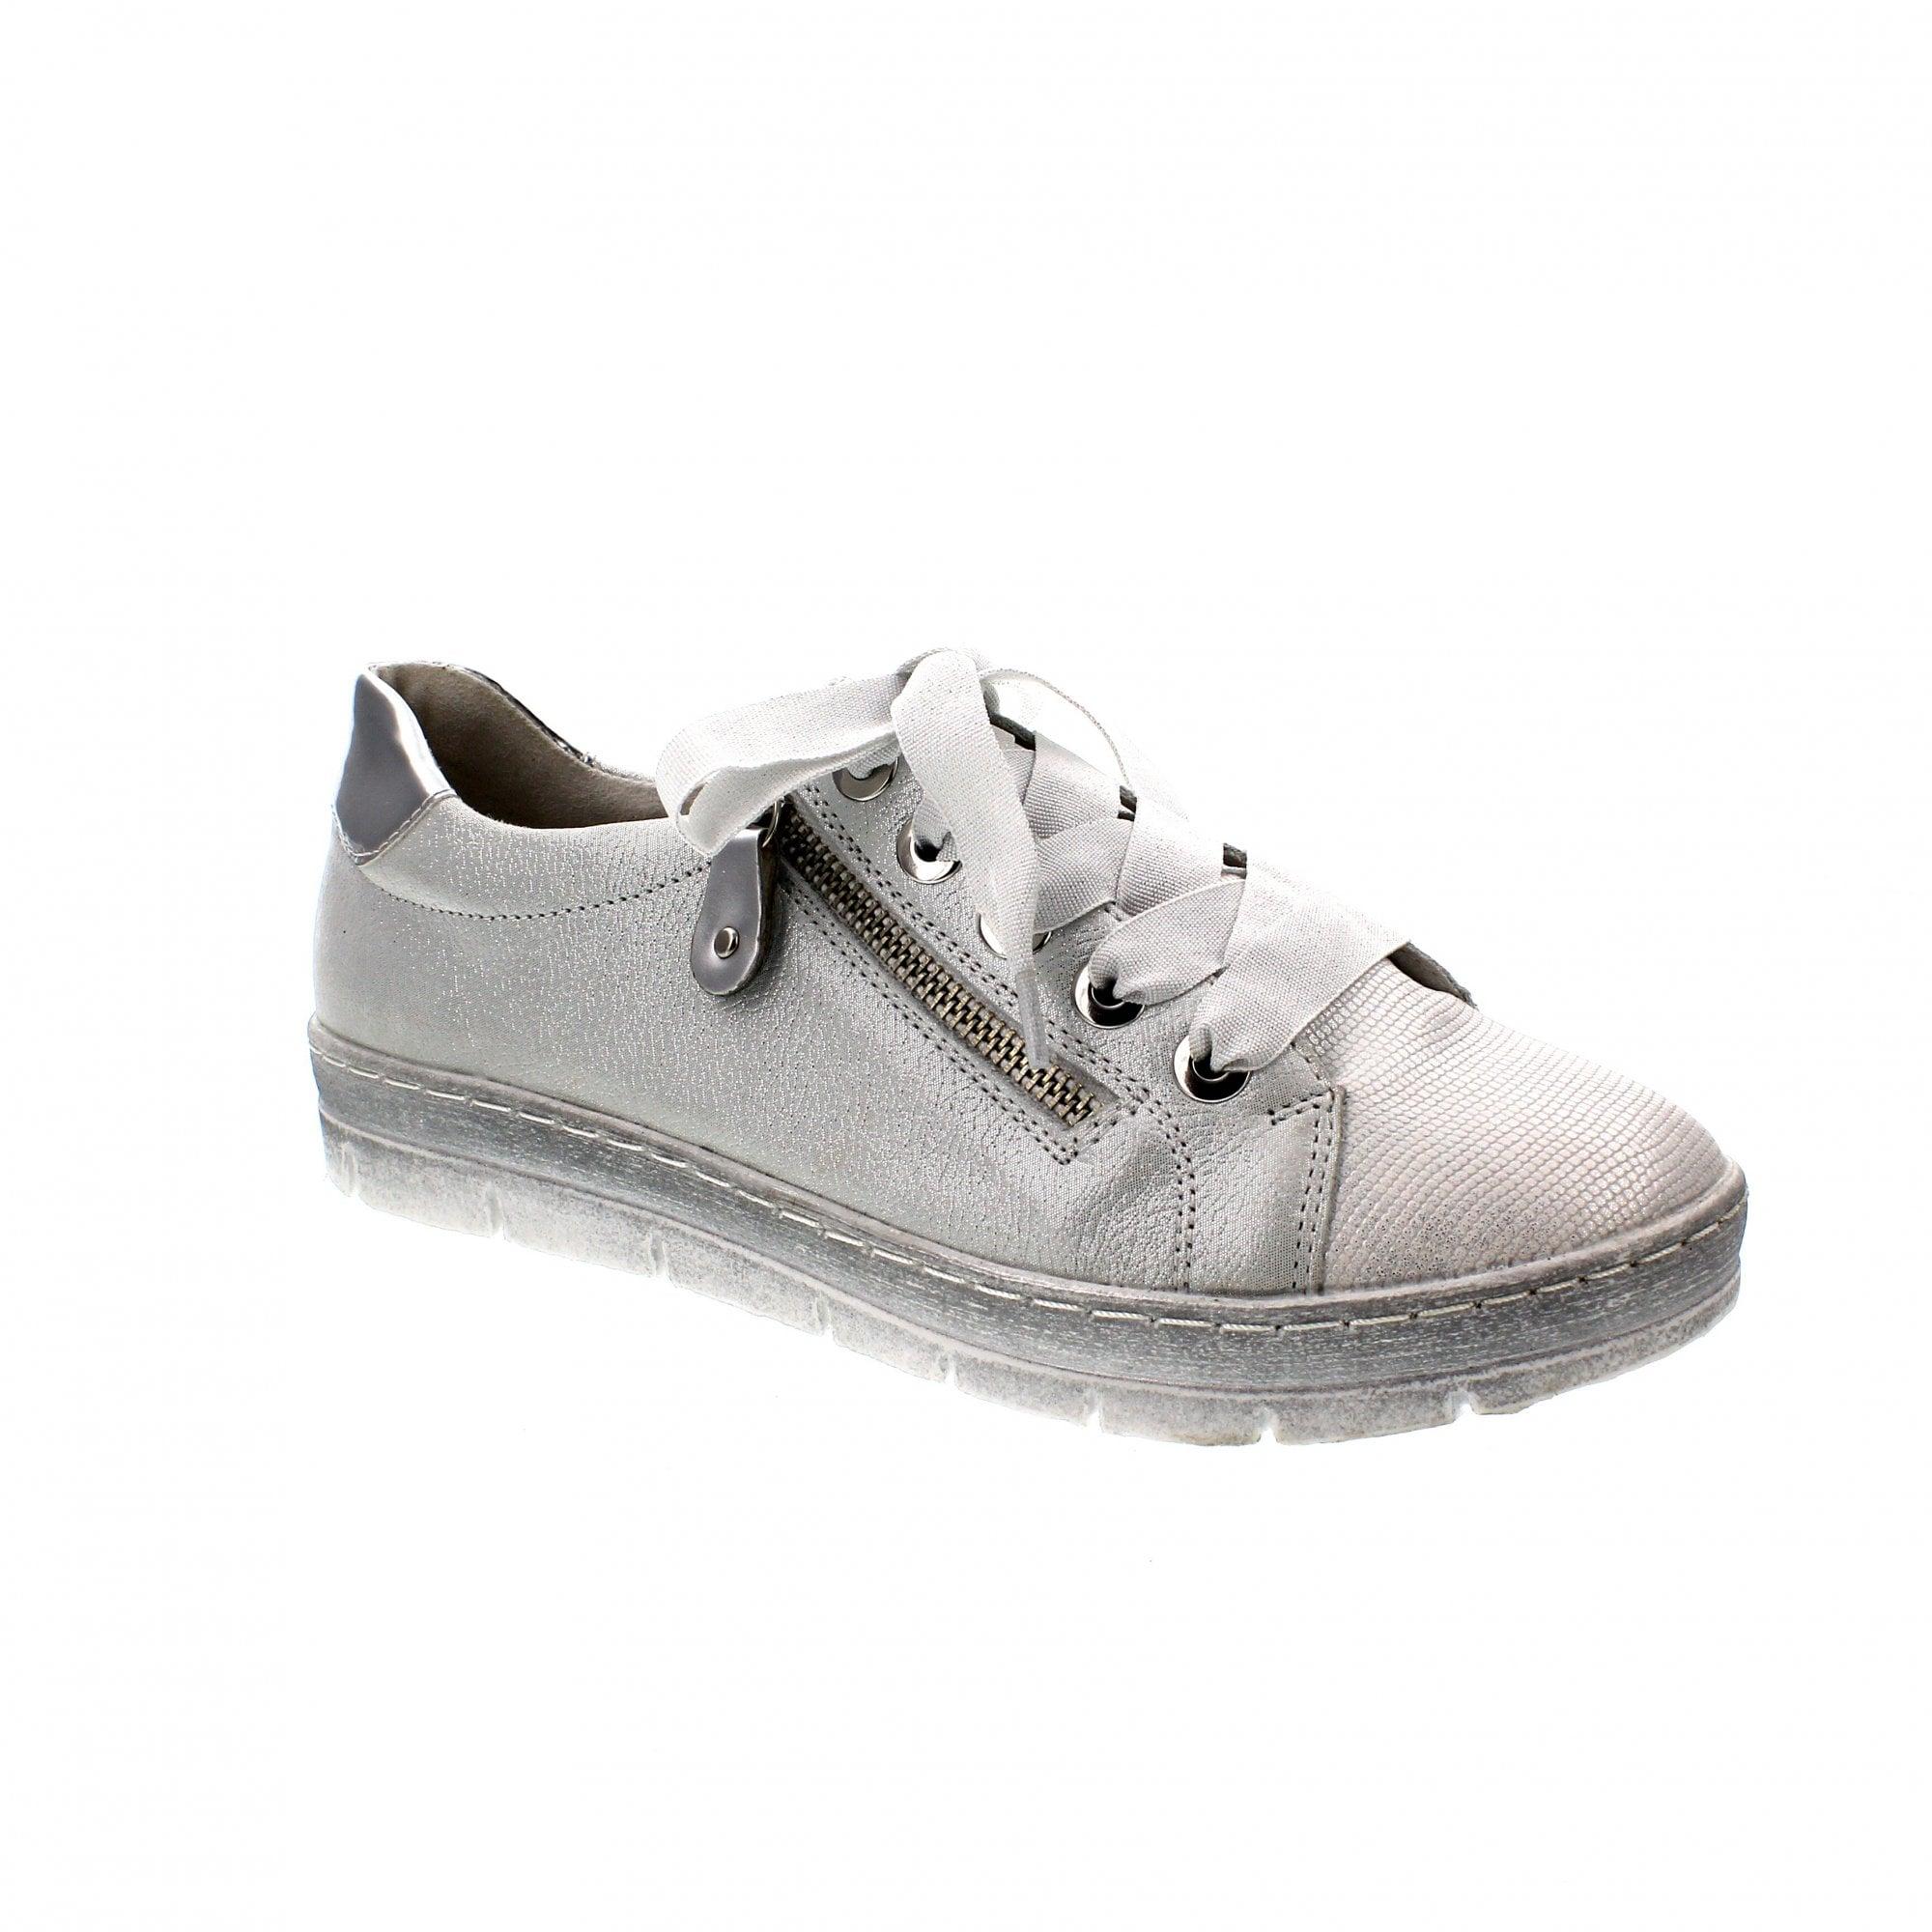 8c0614df8902 Remonte D5803-97 Womens Trainers | Rogerson Shoes